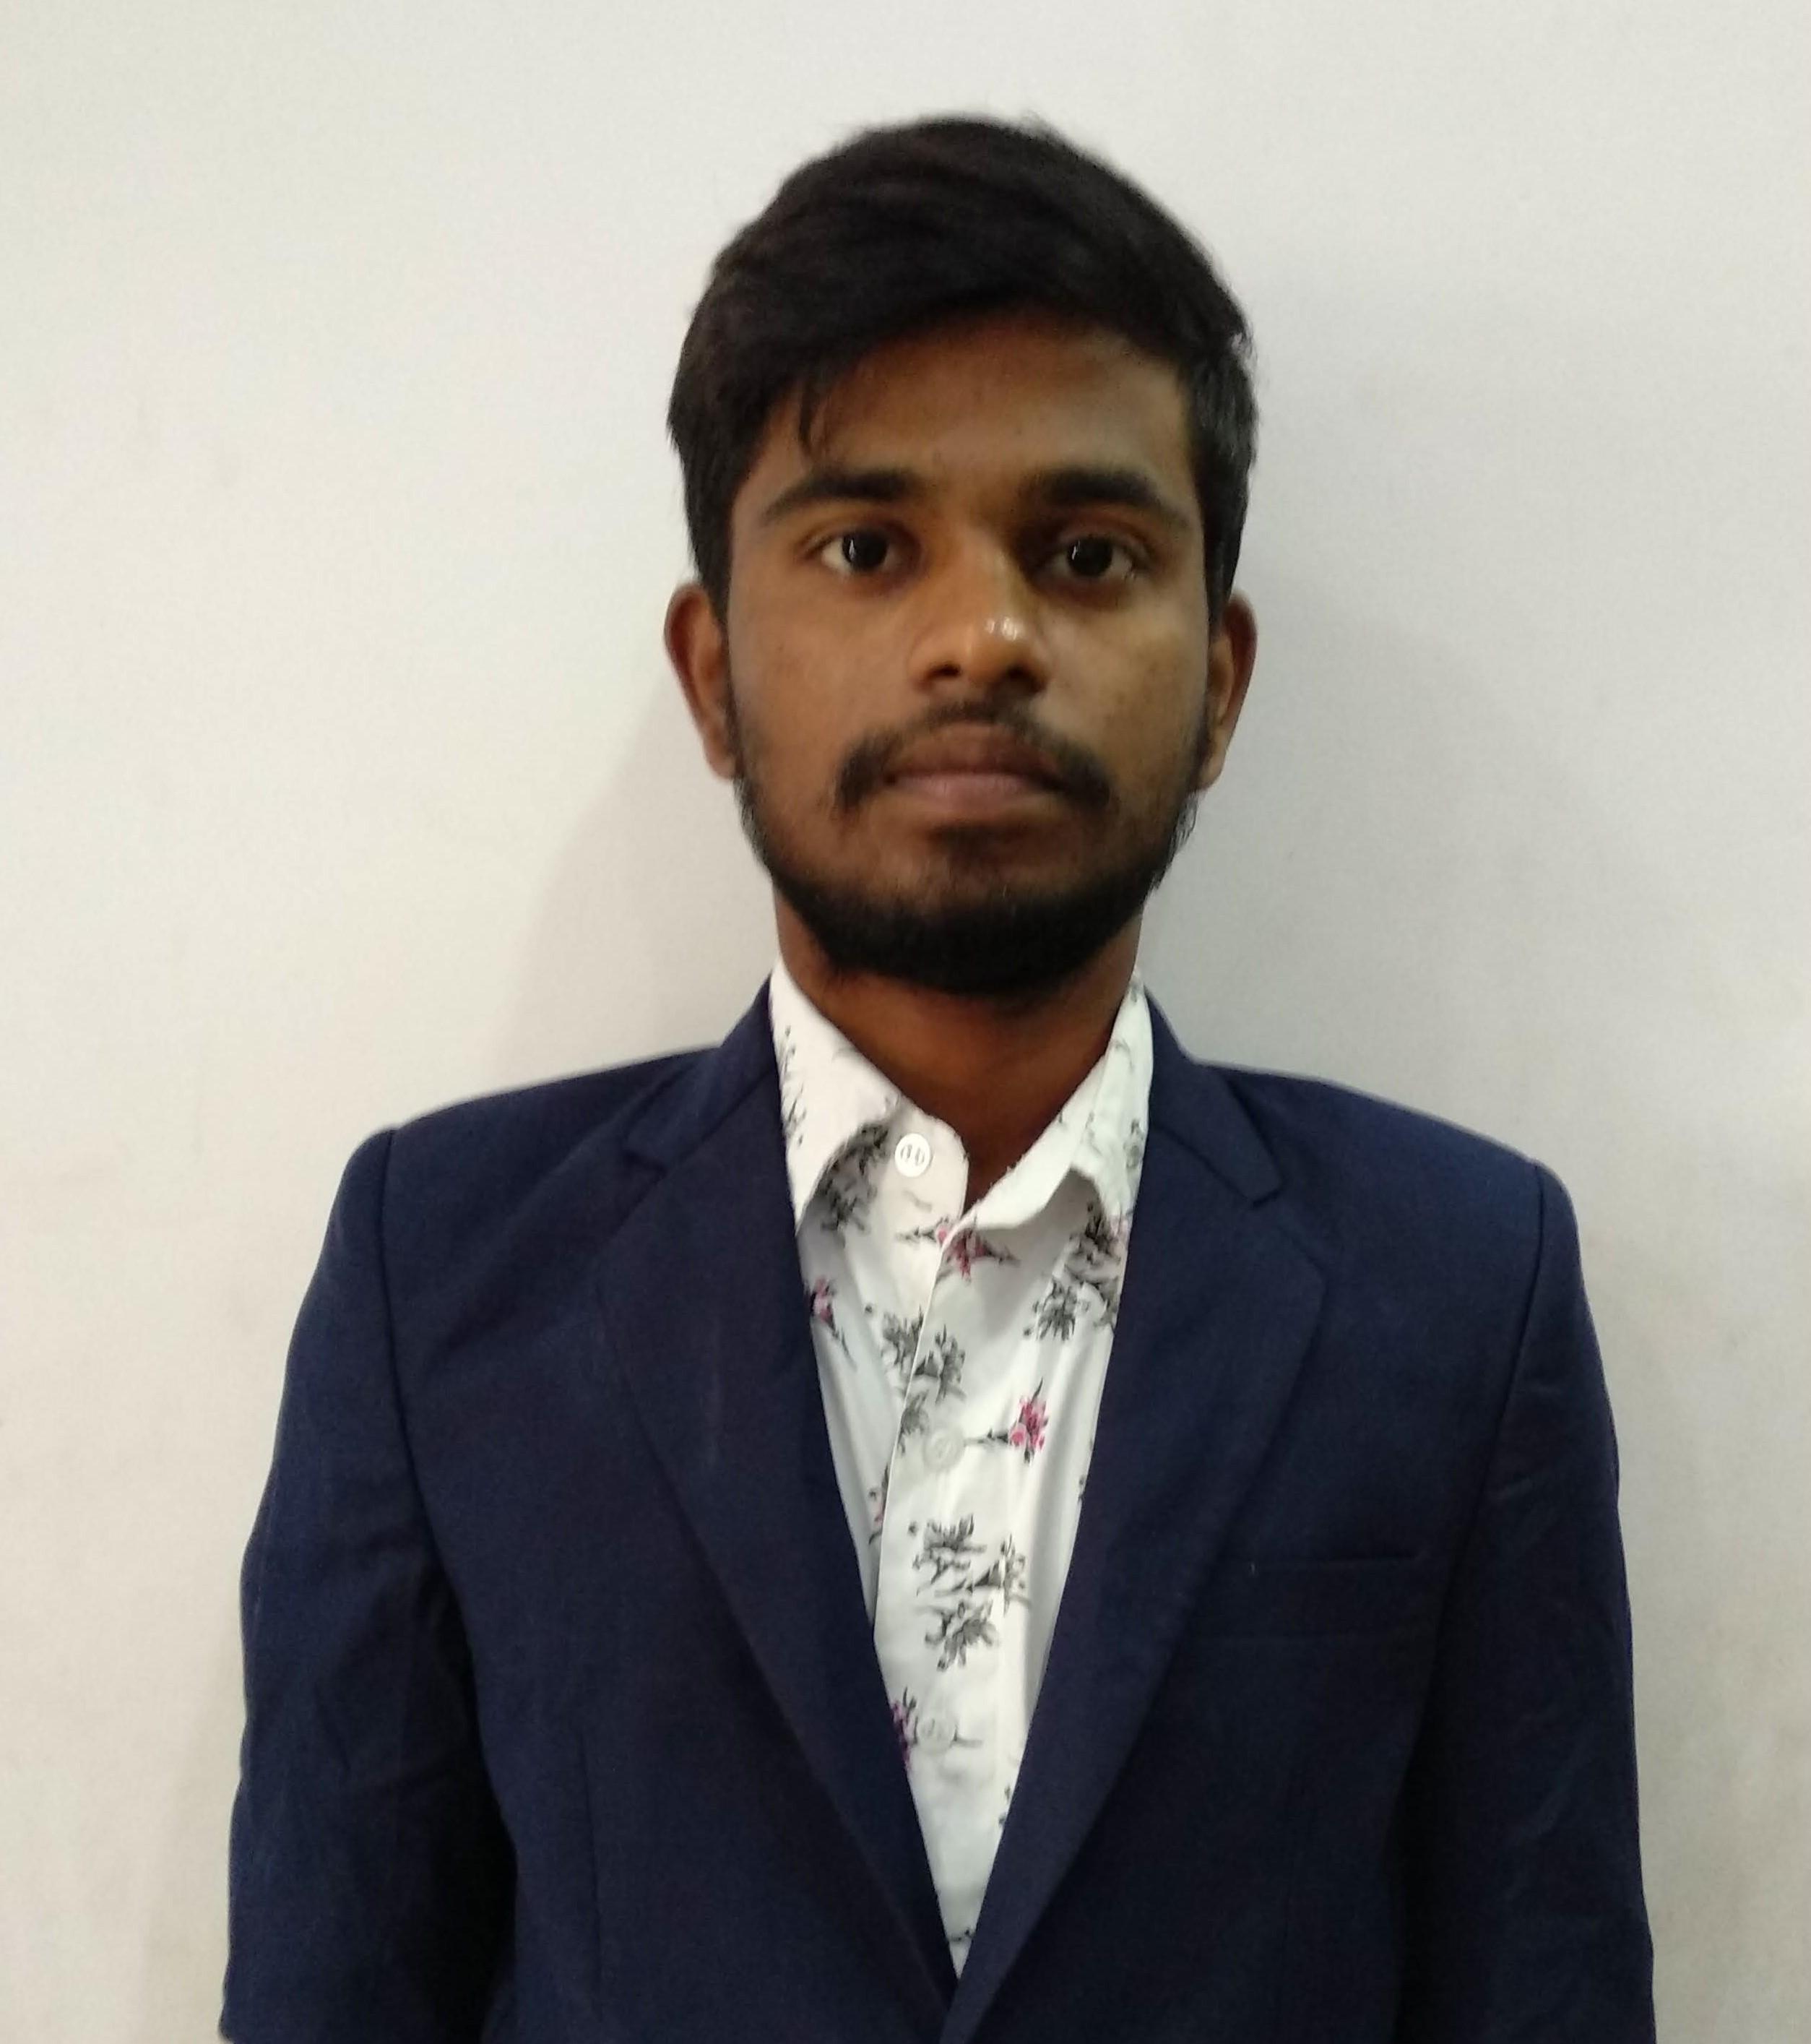 images/profile.jpg